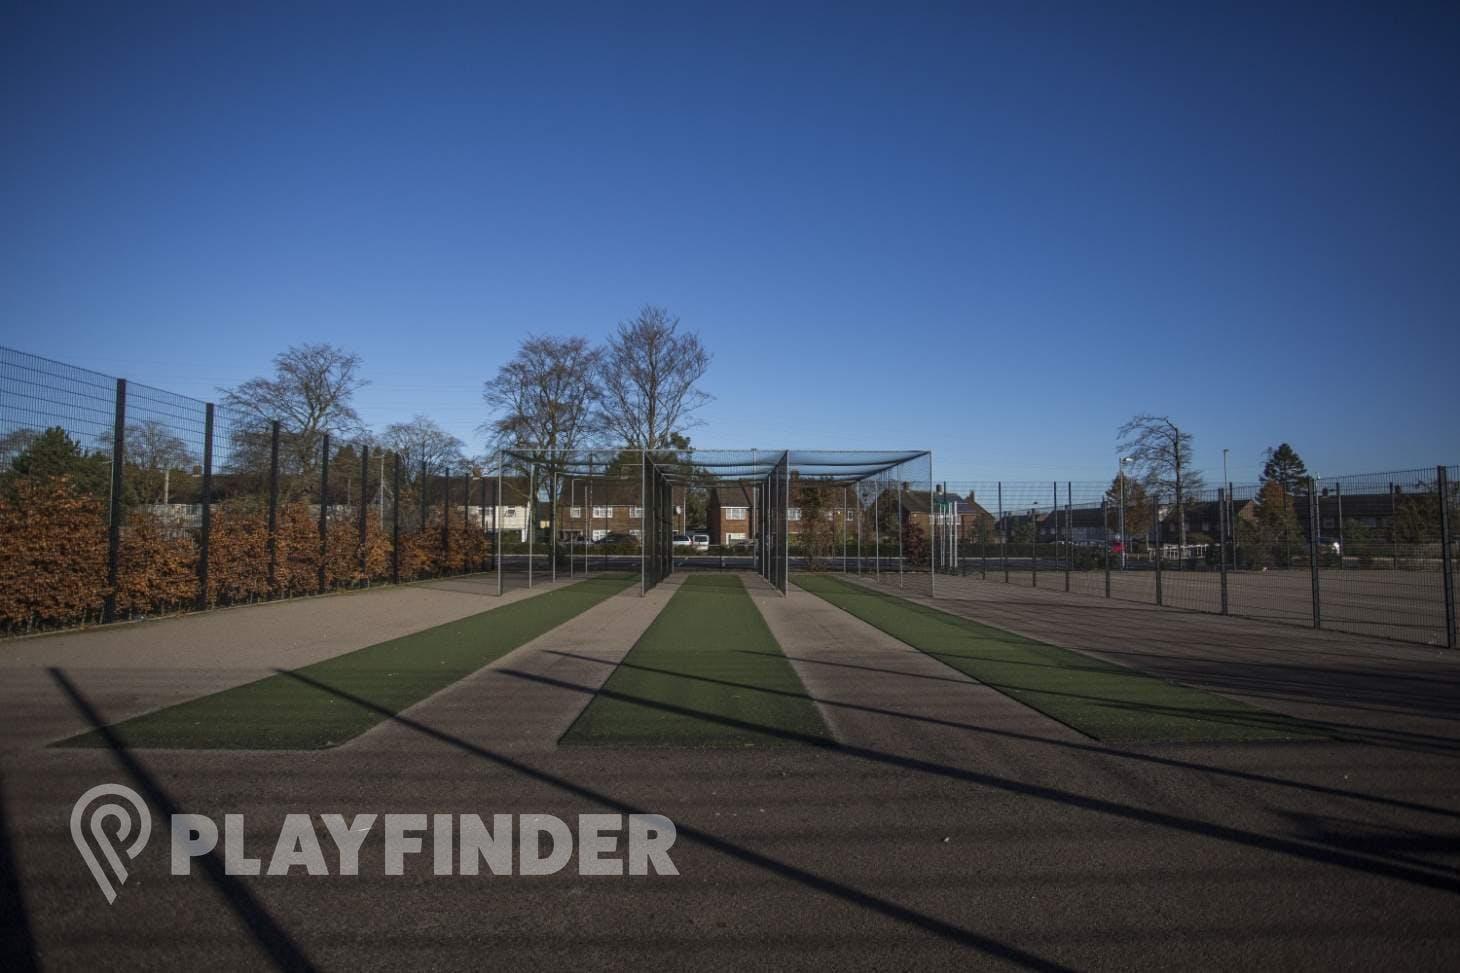 Stockwood Park Academy Nets | Artificial cricket facilities